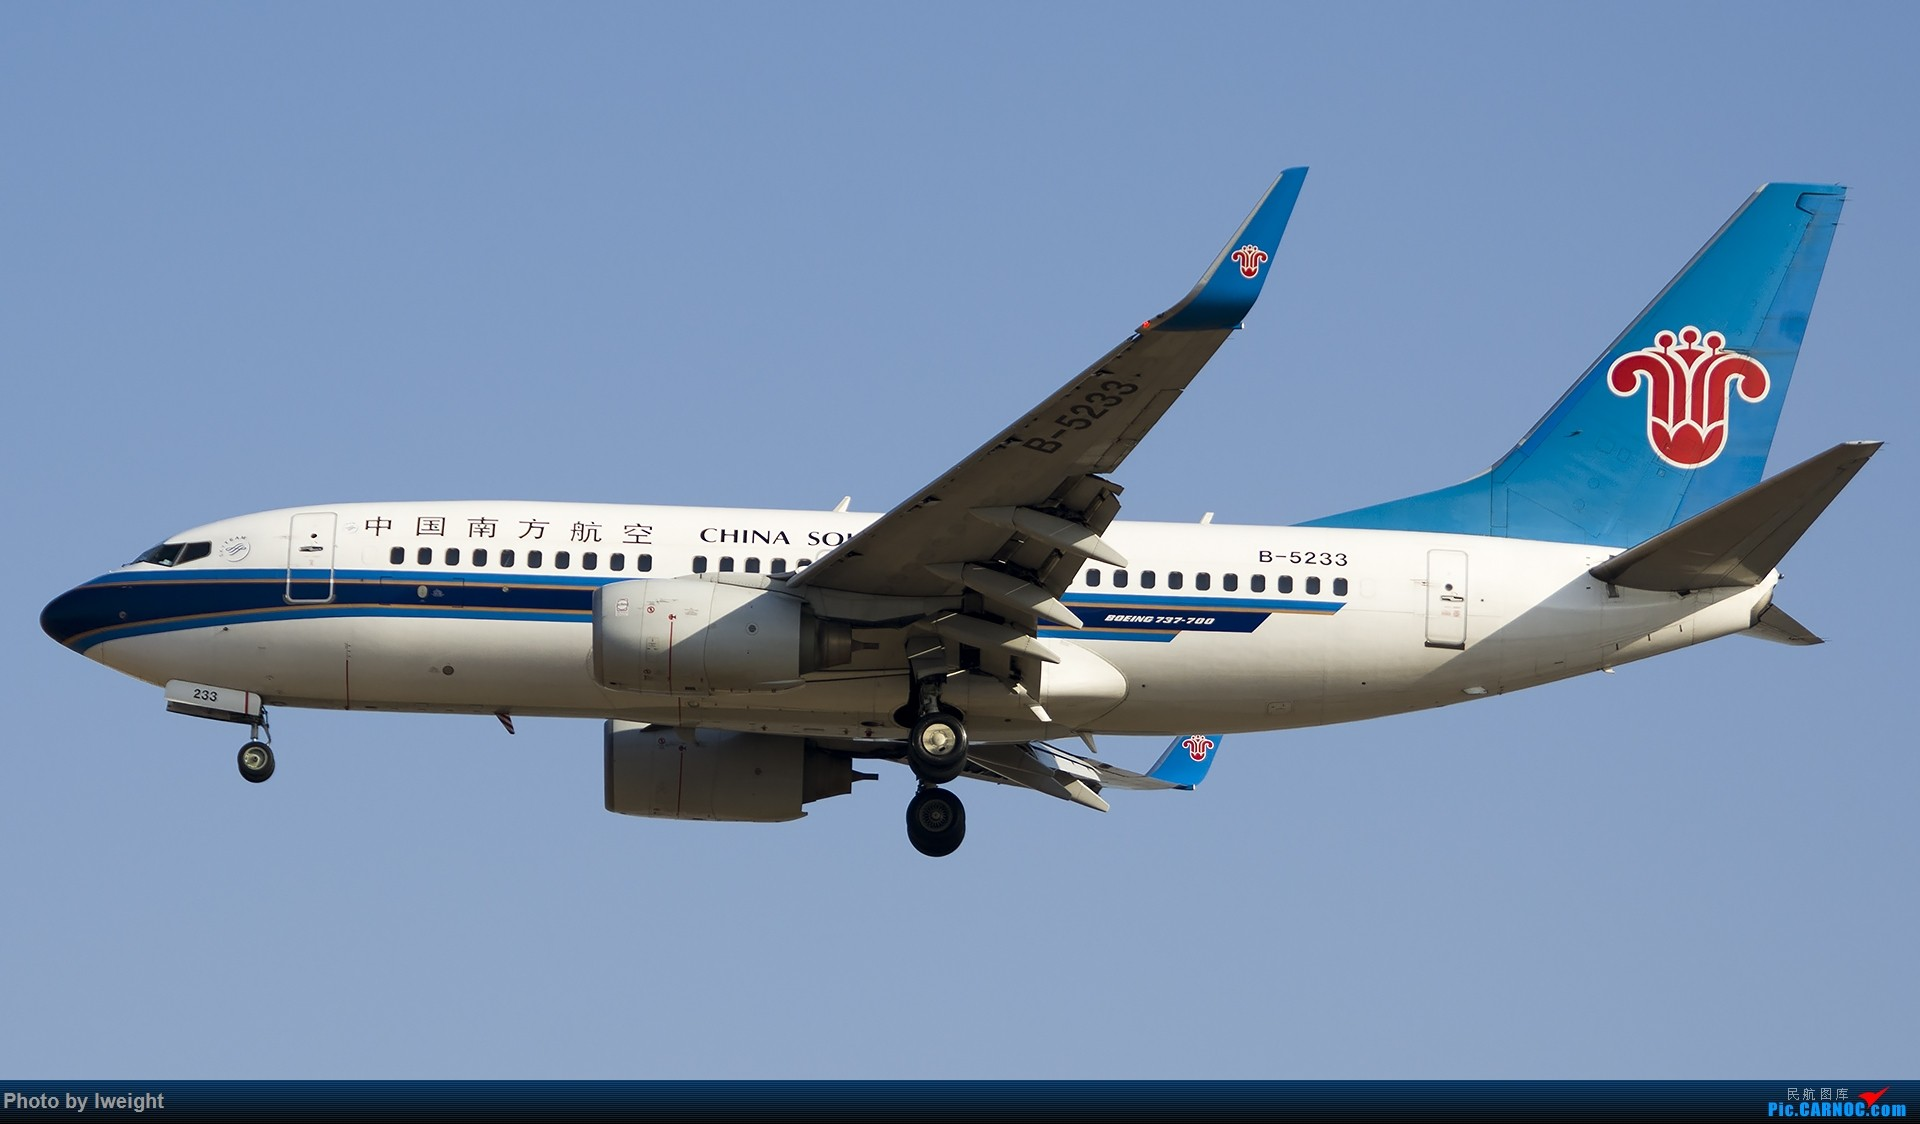 Re:[原创]庆祝升级777,发上今天在首都机场拍的所有飞机【2014-12-14】 BOEING 737-700 B-5233 中国北京首都国际机场